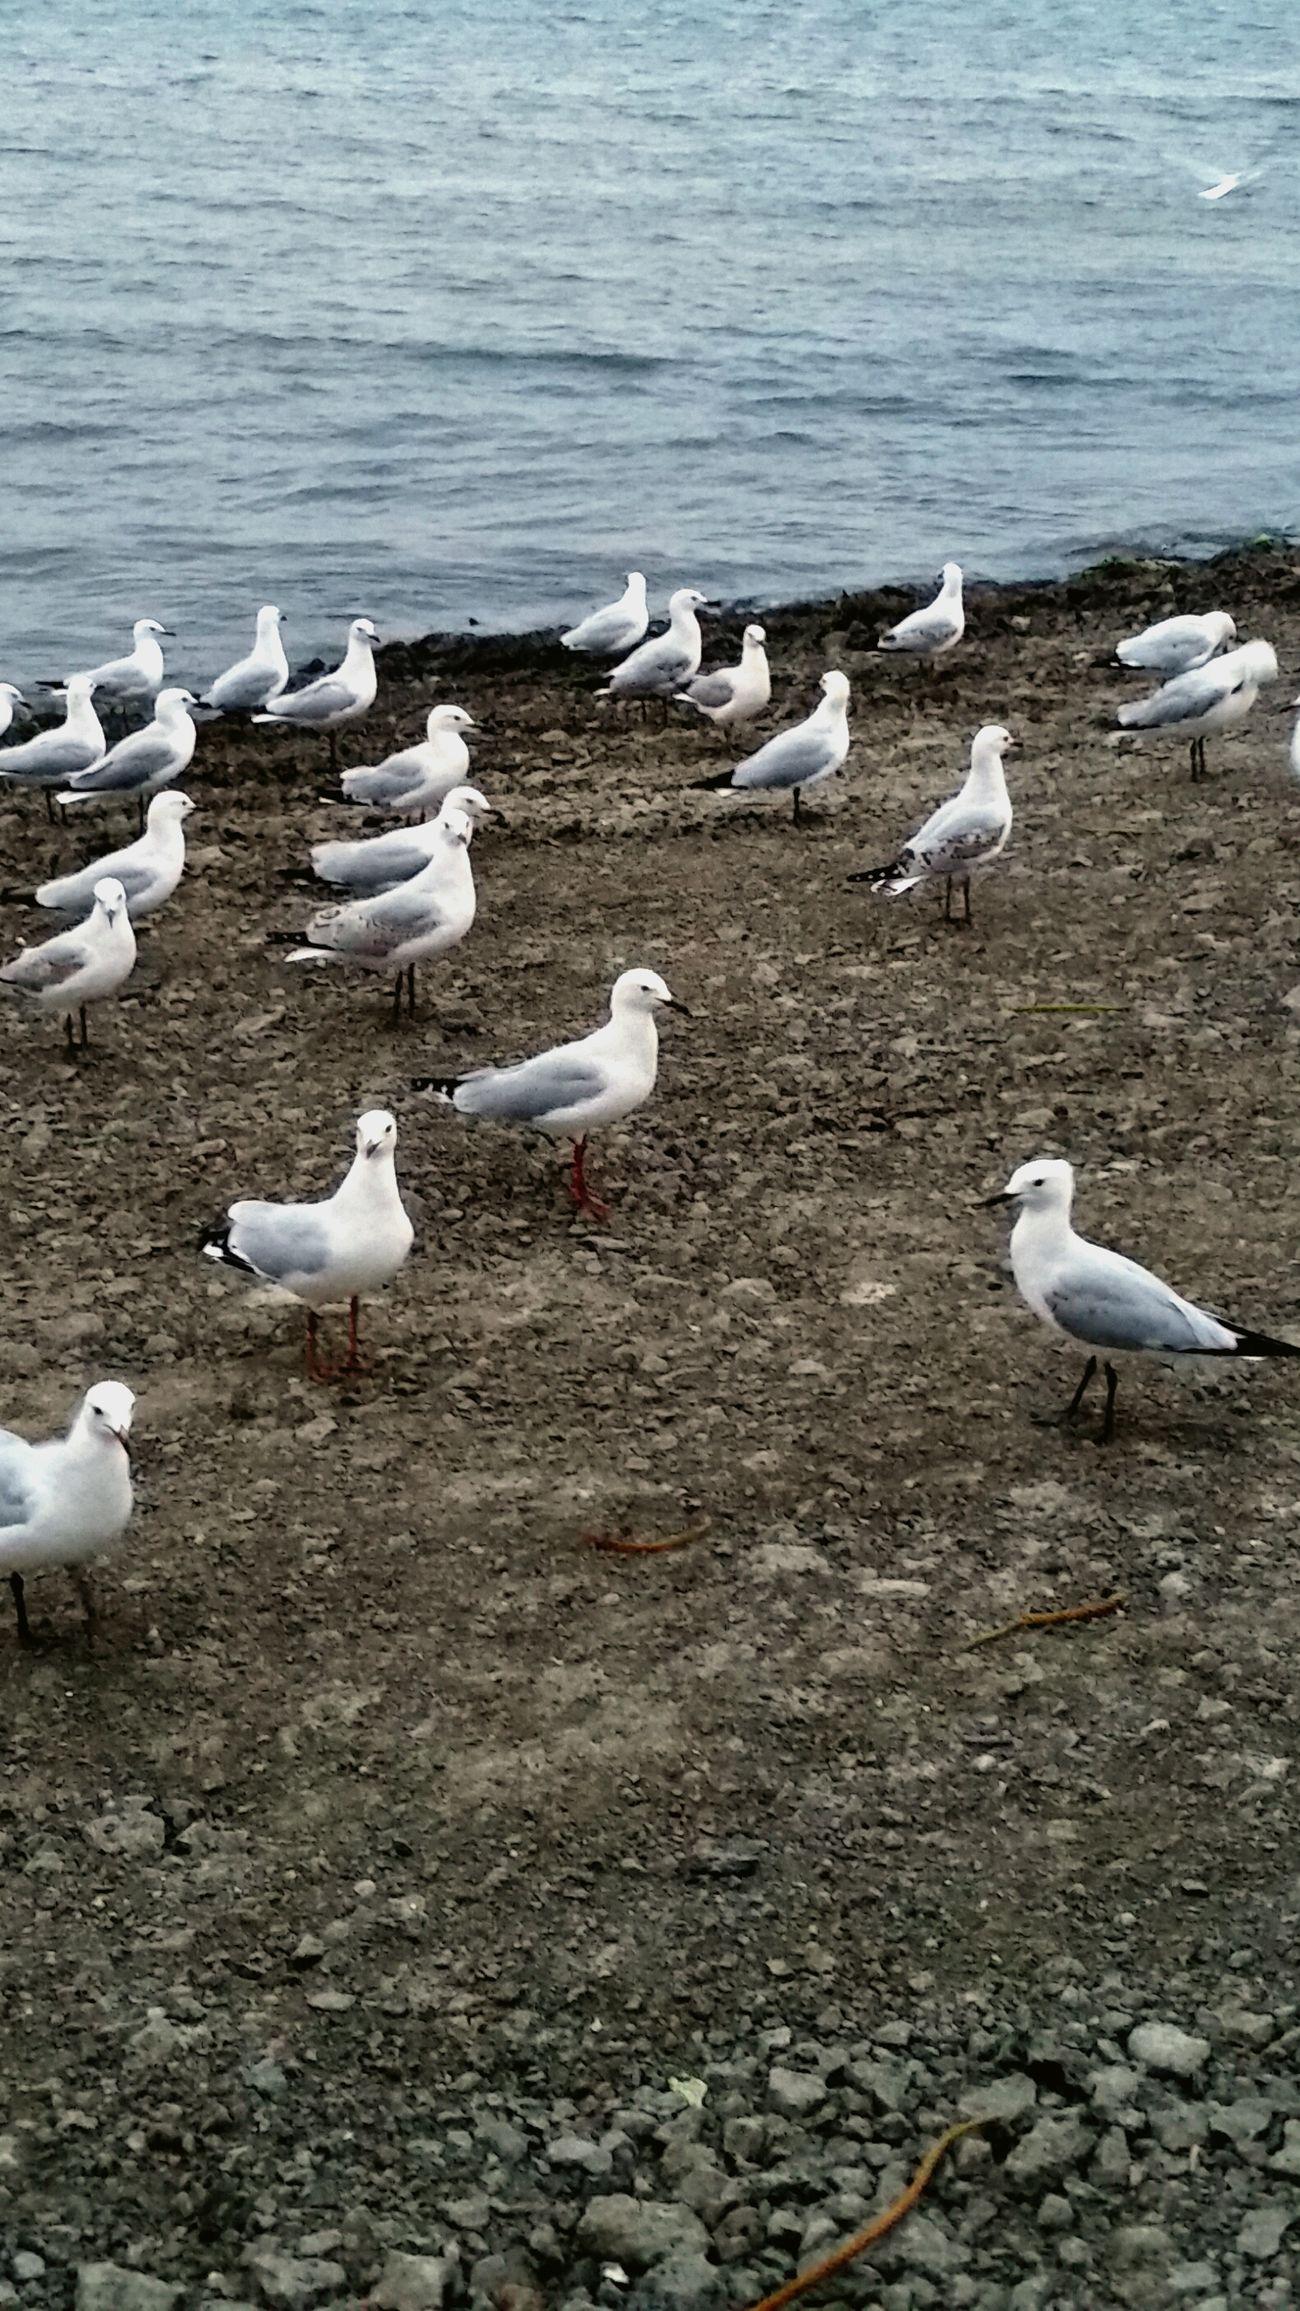 Beach Bums Well Fed Seagulls